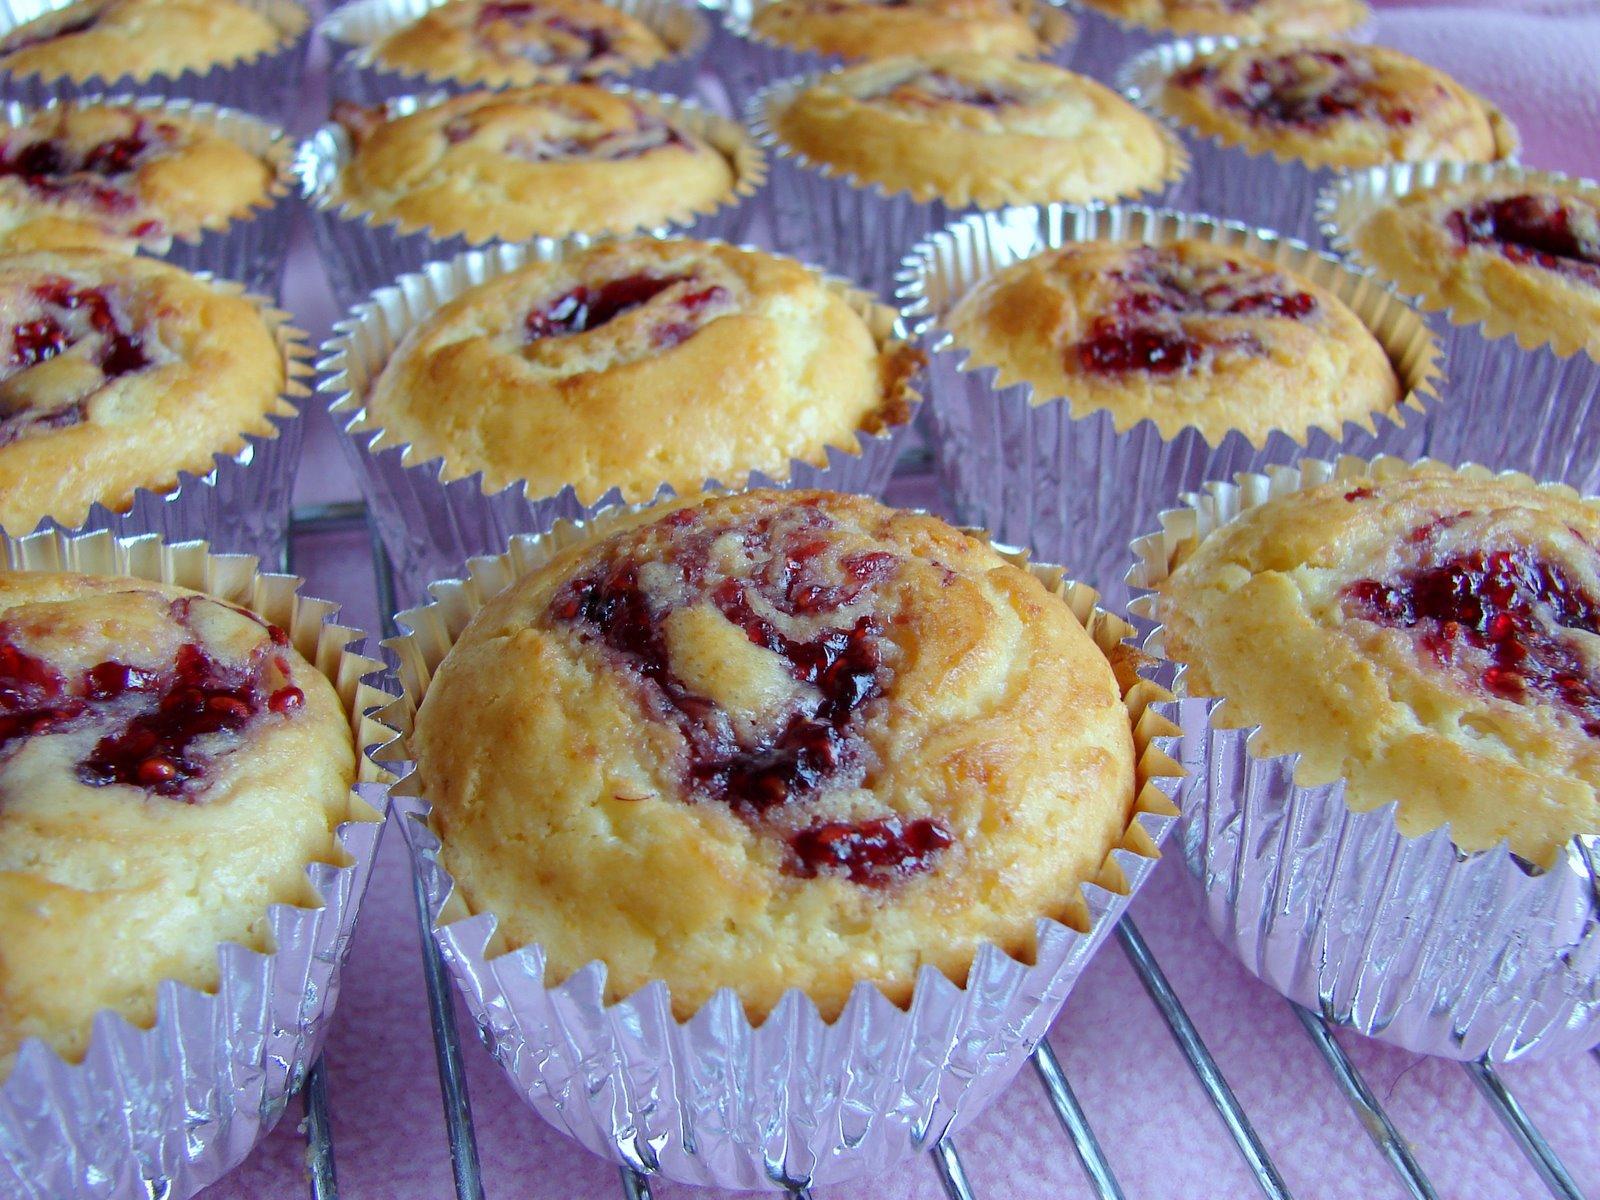 [muffins]